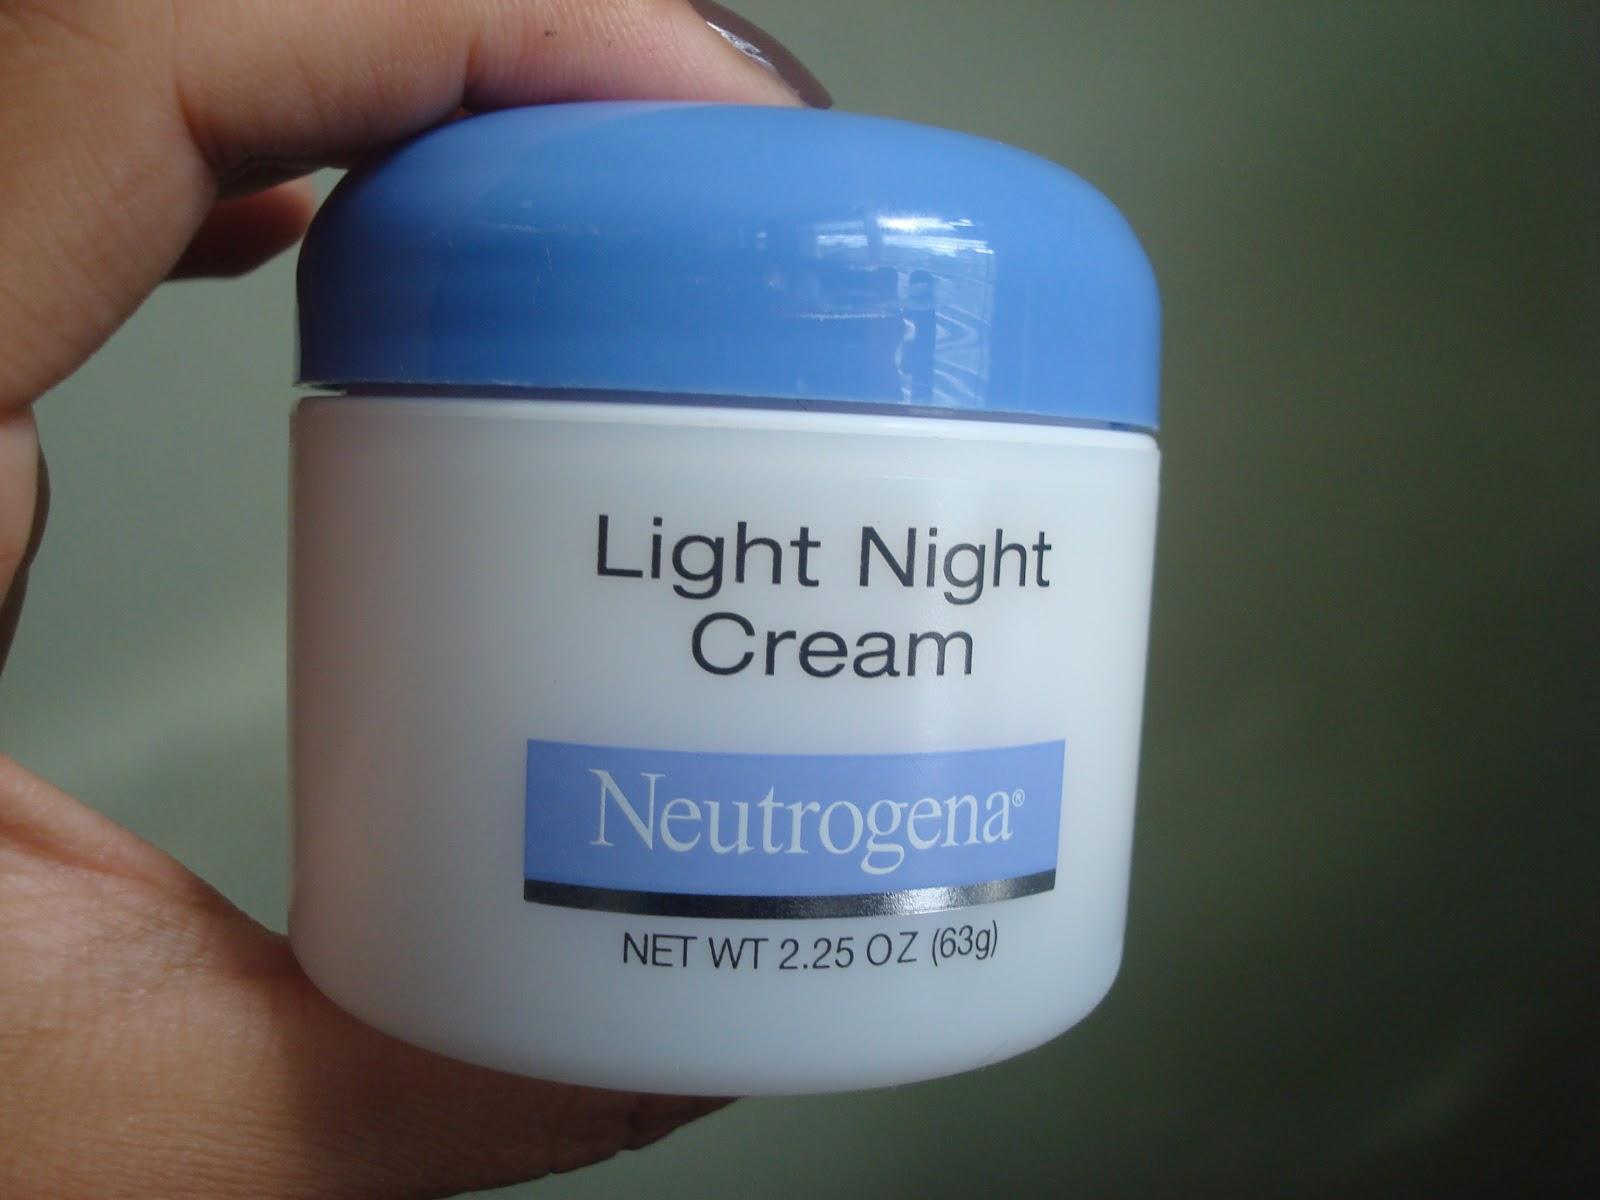 night cream brands neutrogena light night cream review cheap makeup. Black Bedroom Furniture Sets. Home Design Ideas